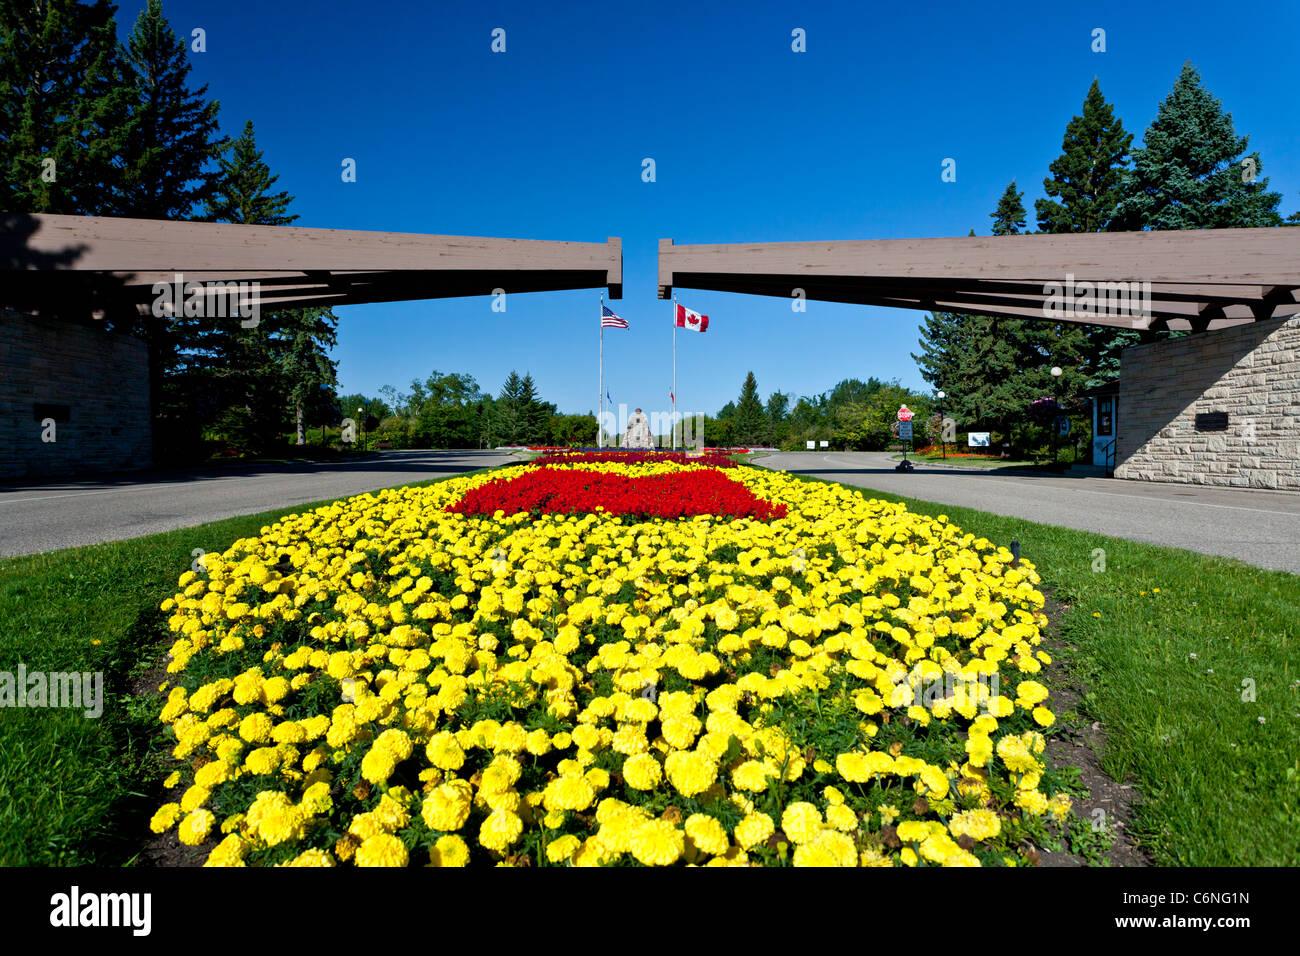 The International Peace Gardens park near Bottineau, North Dakota and Boissevain, Manitoba, Canada